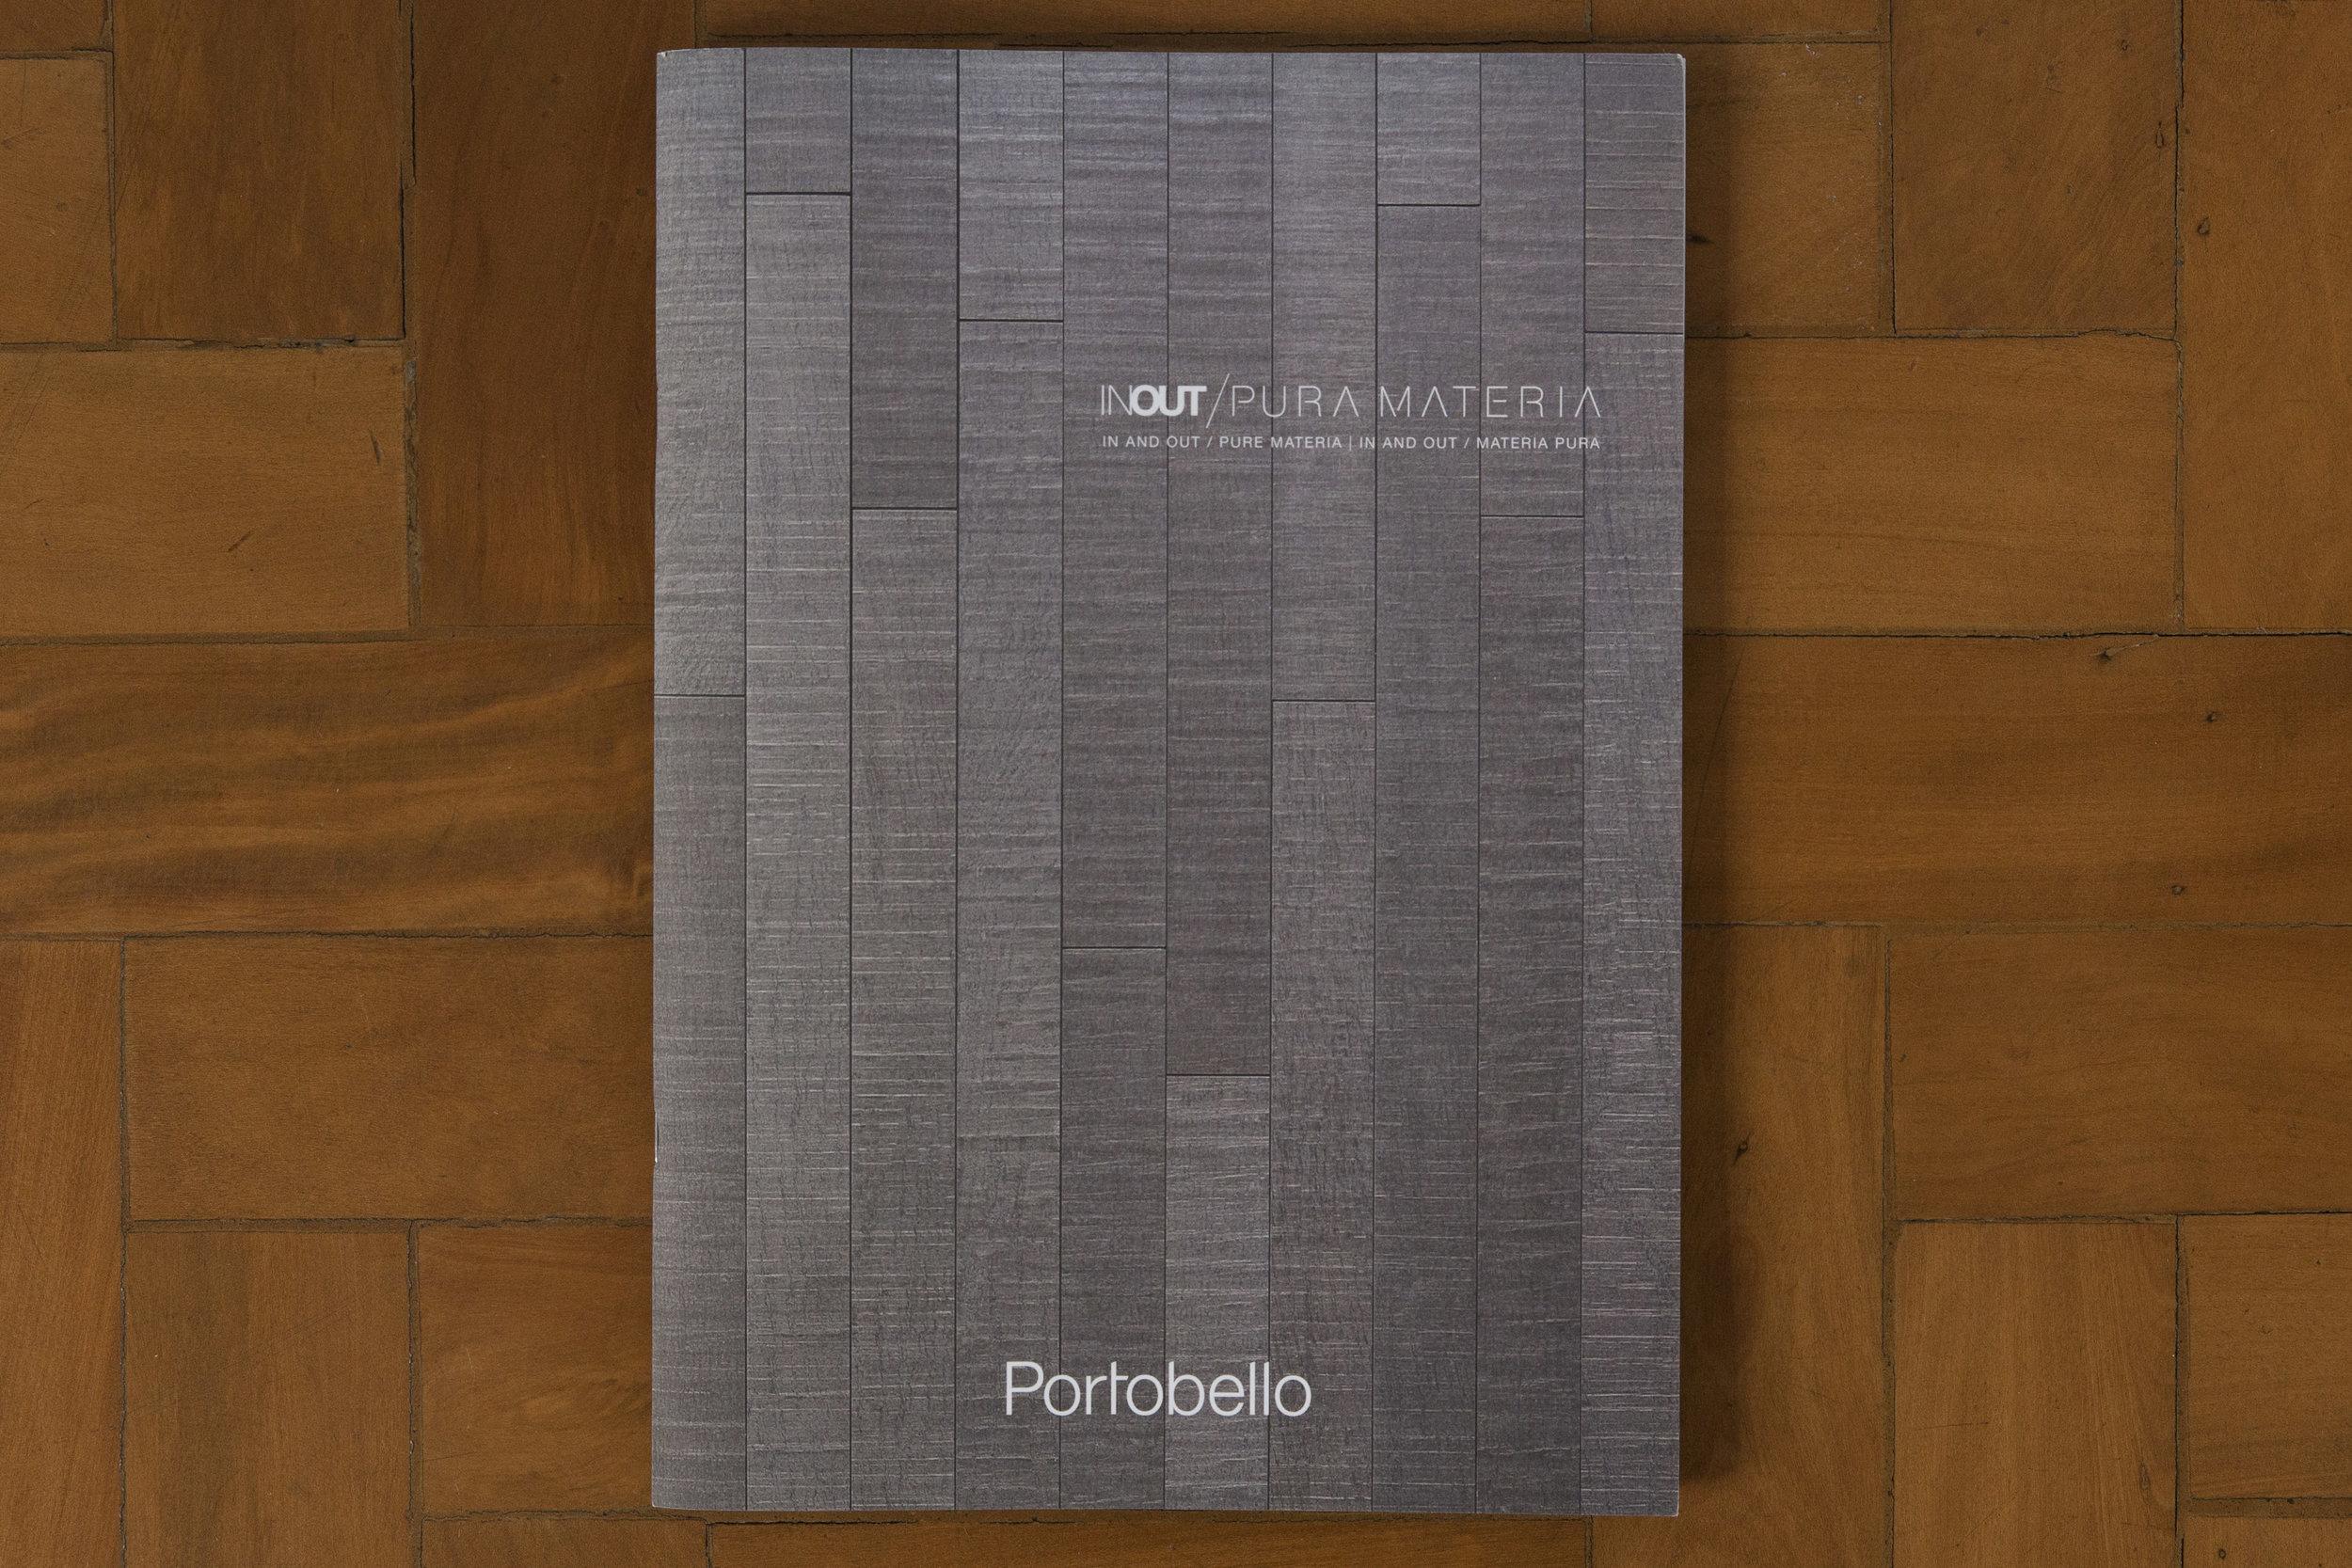 Catalogo_Portobello2-1.jpg